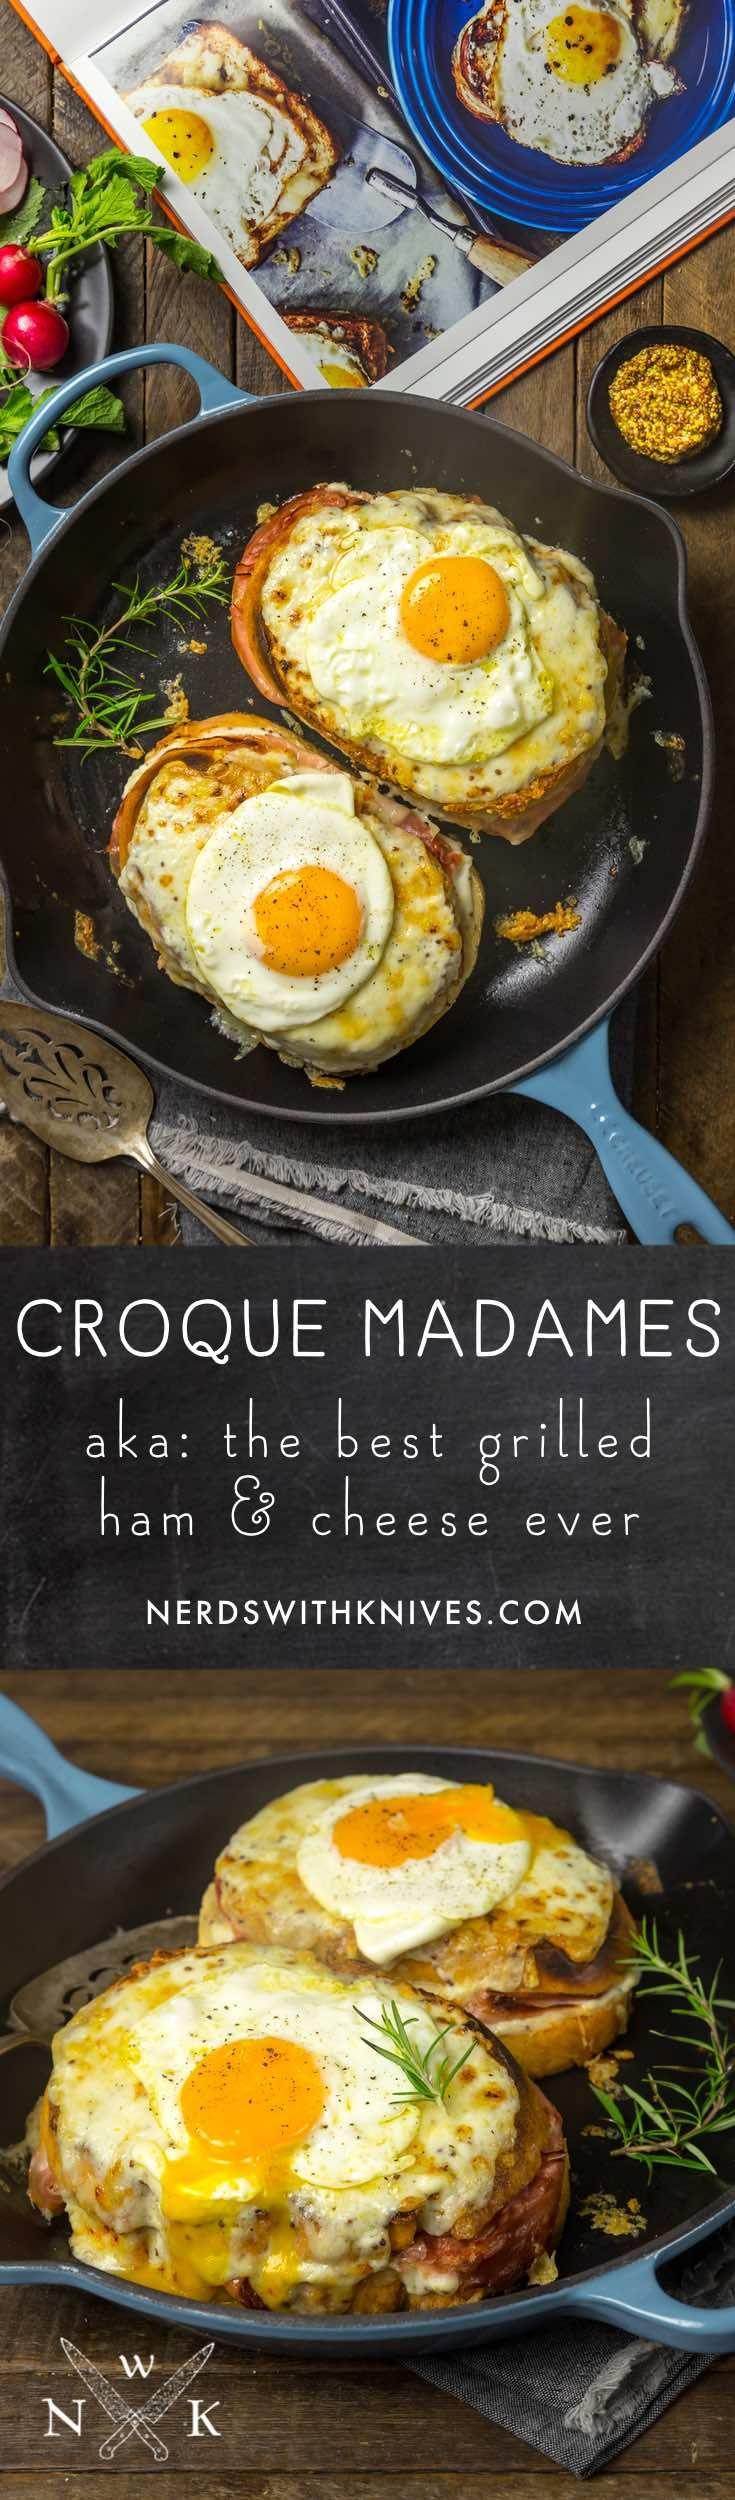 Croquemadames recipe grilled ham cheese food